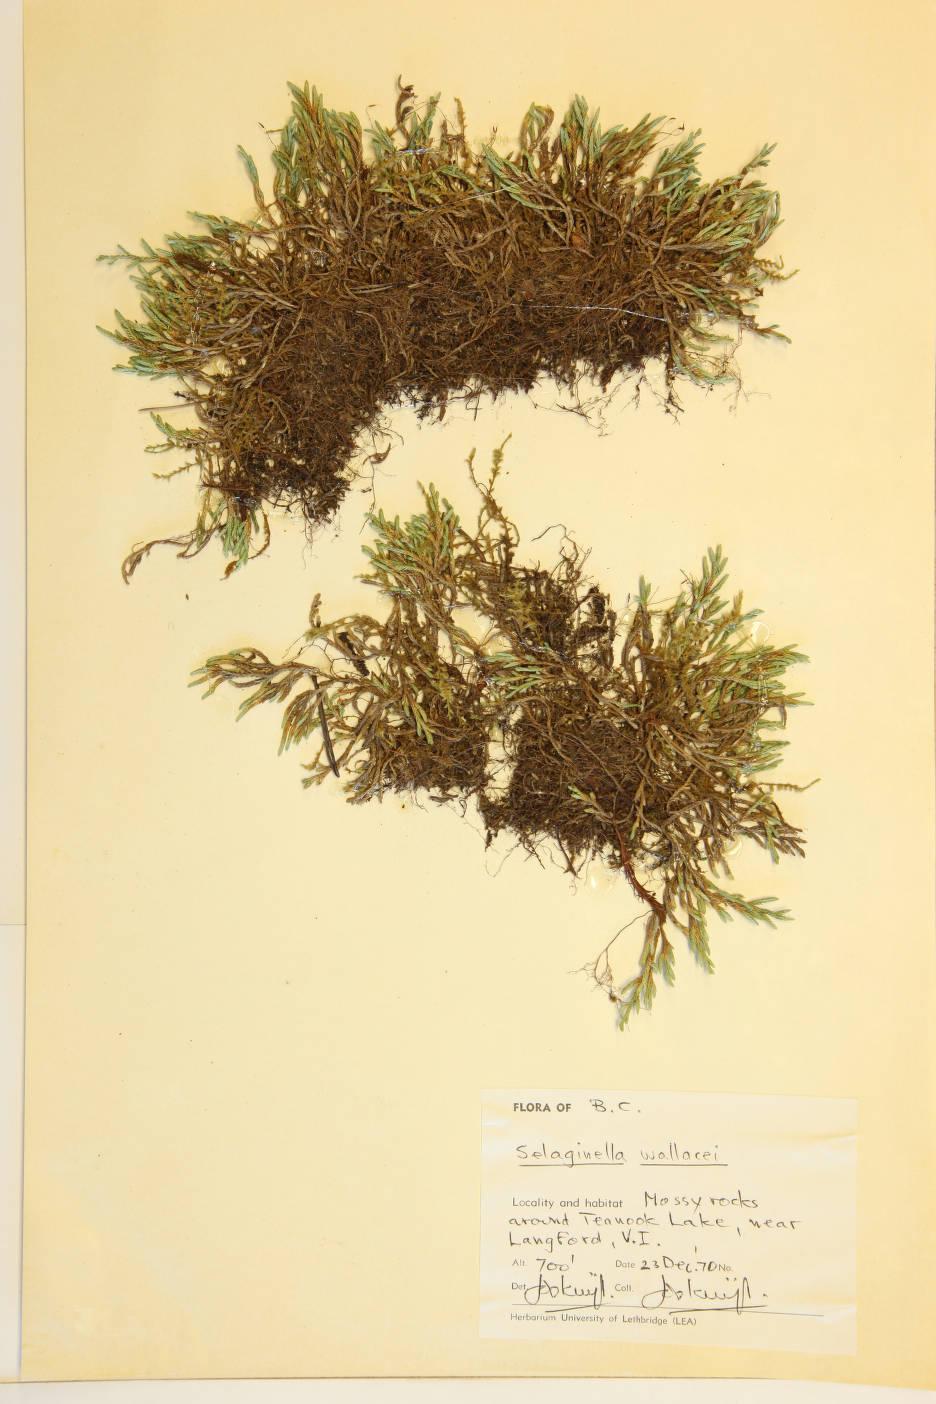 Selaginella wallacei image